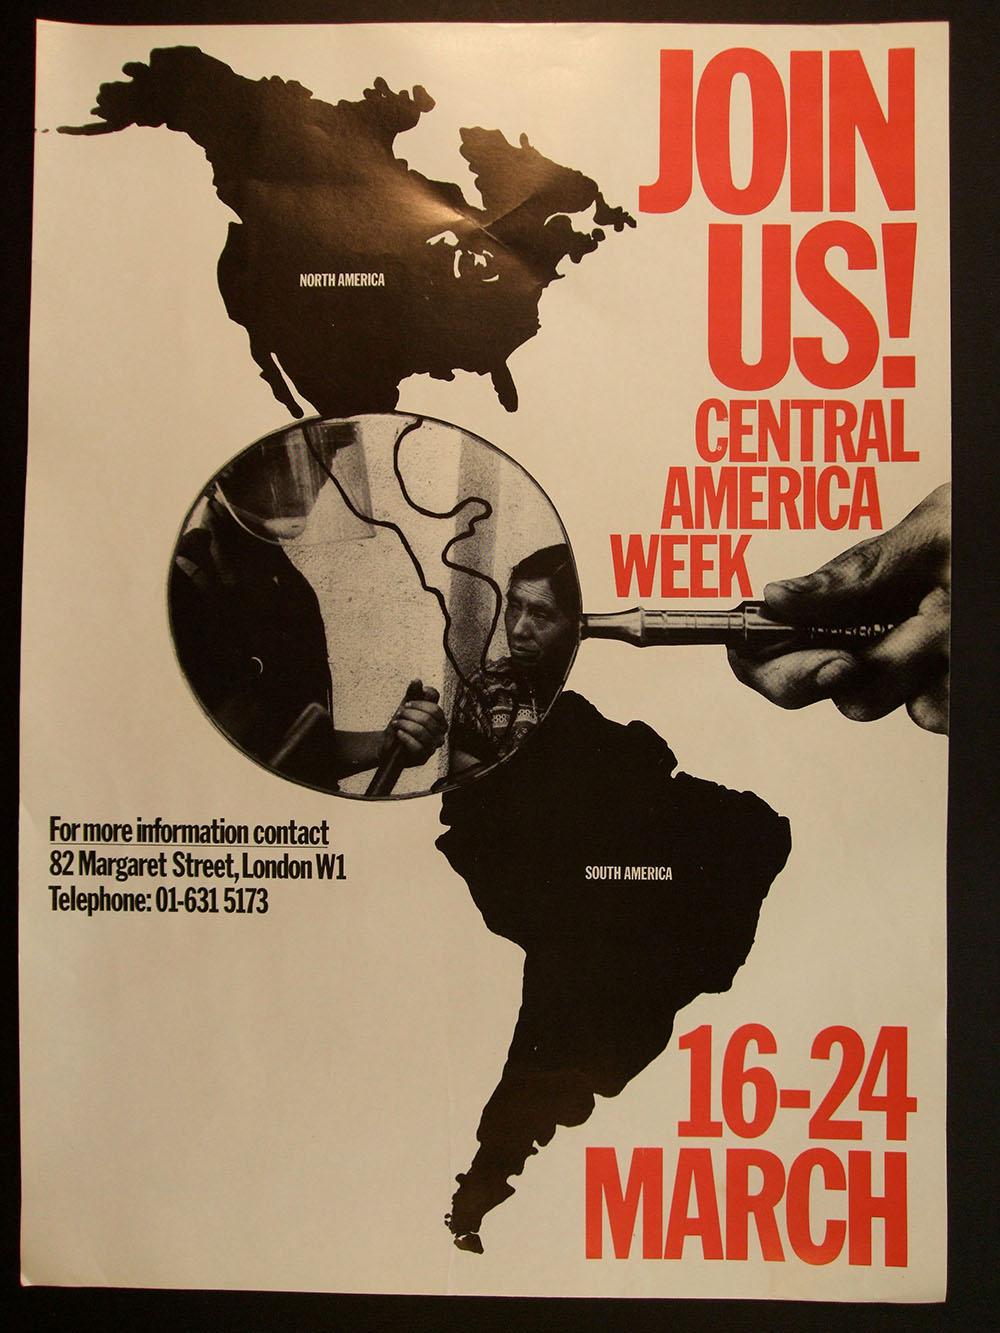 centralamericaweek.jpg